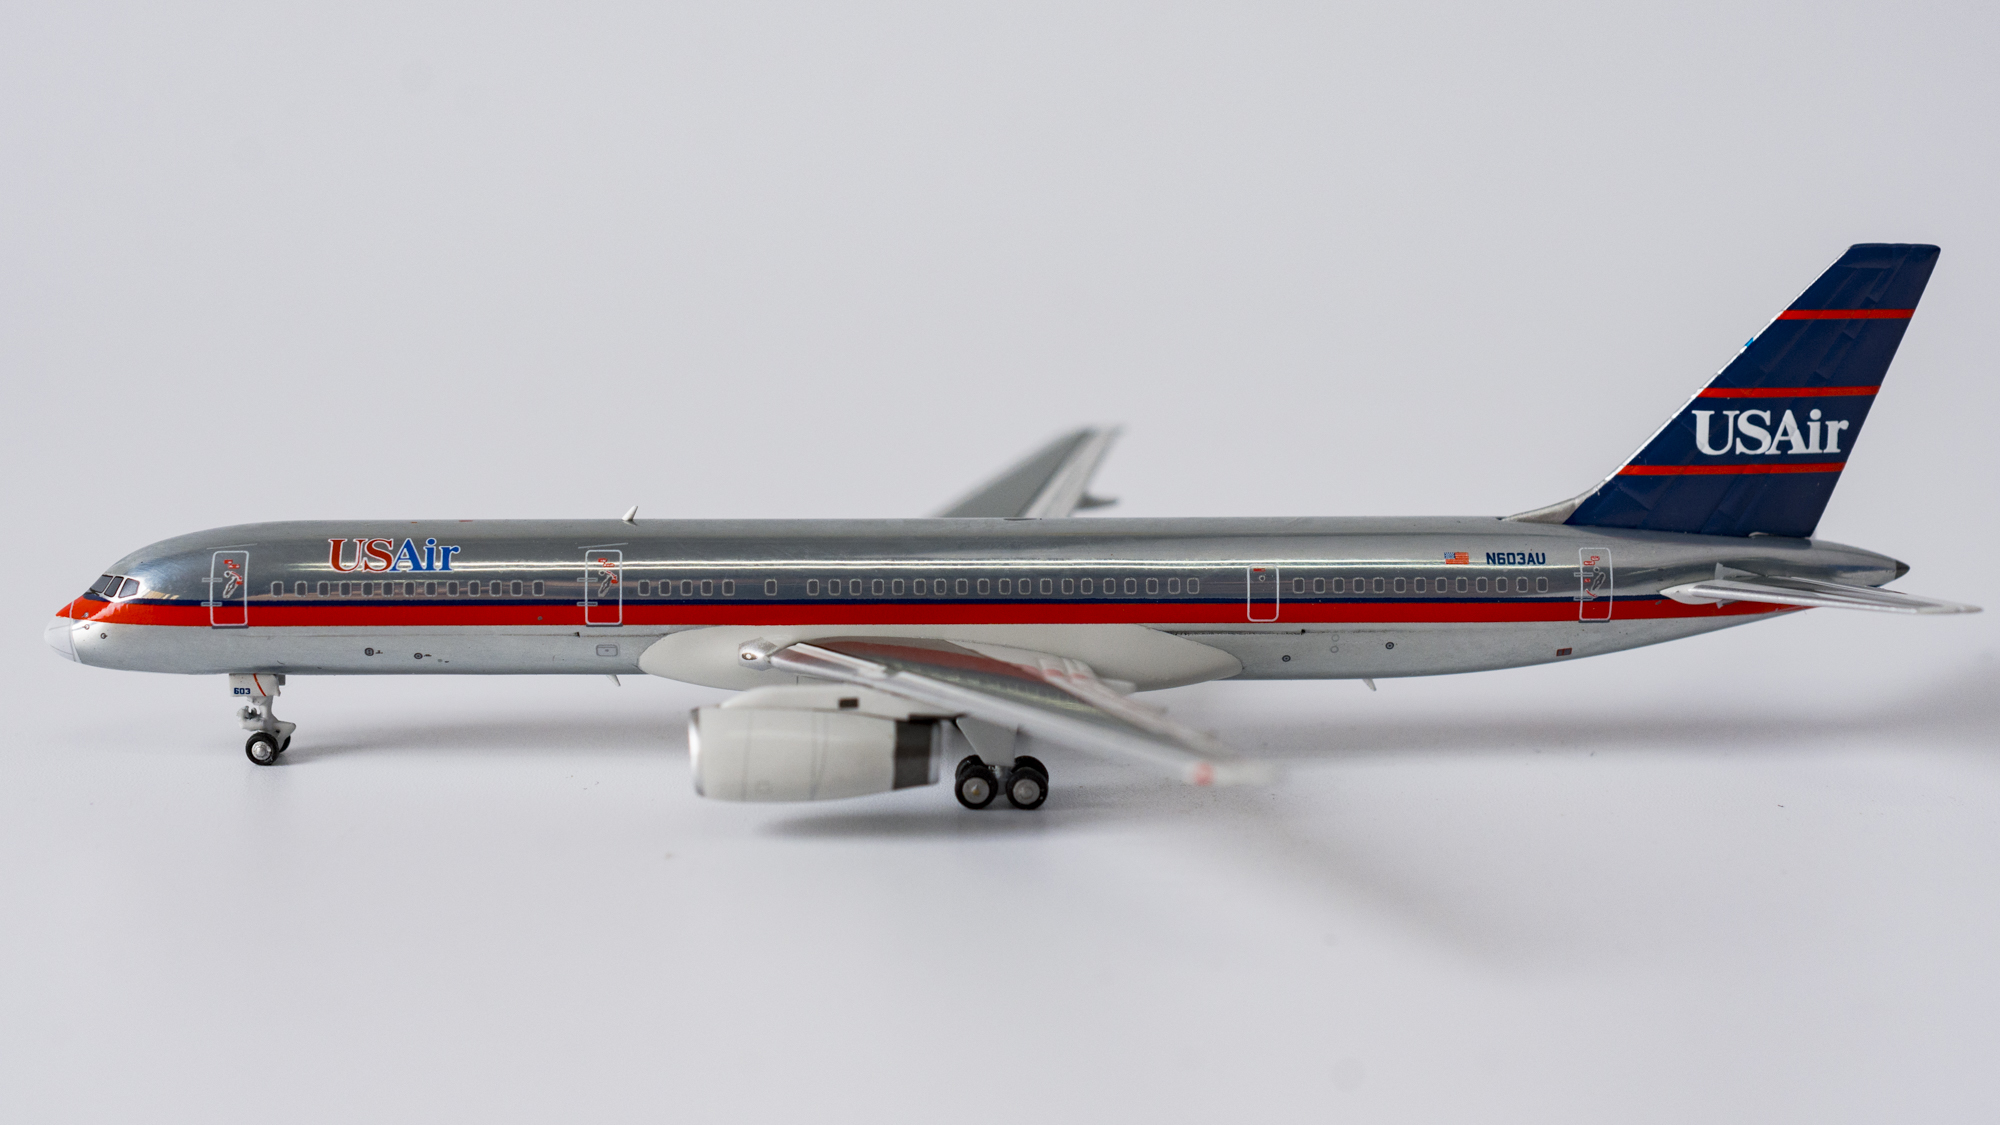 1:400 NG Model USAir 757-200 N603AU 53097